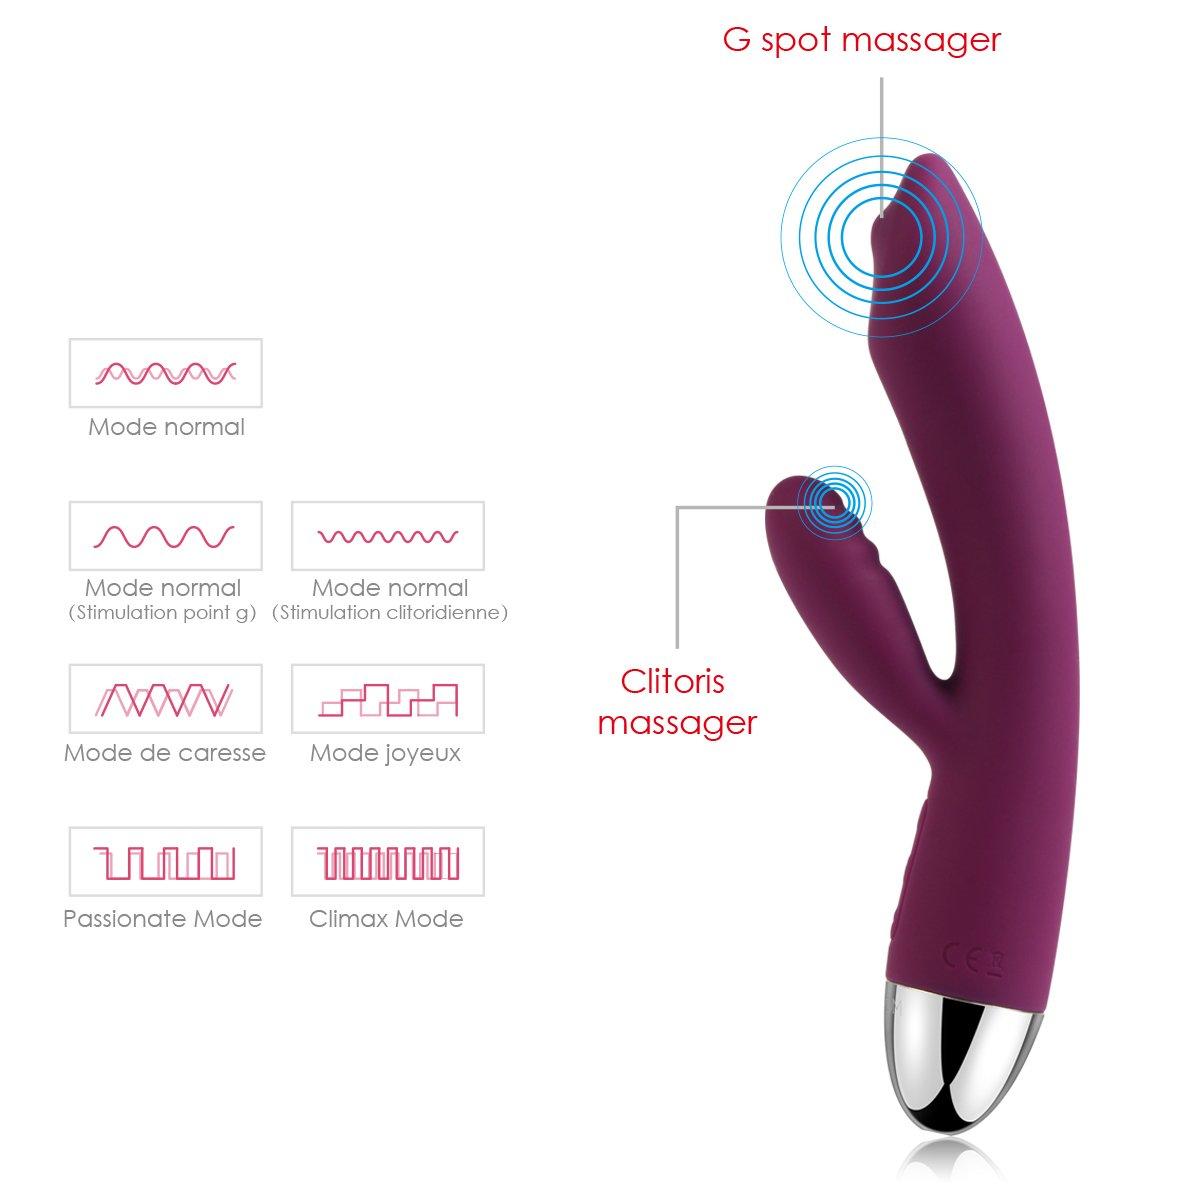 Amazon.com: SVAKOM Trysta Vibrators Sex Toys for Women G-Spot Wand ...